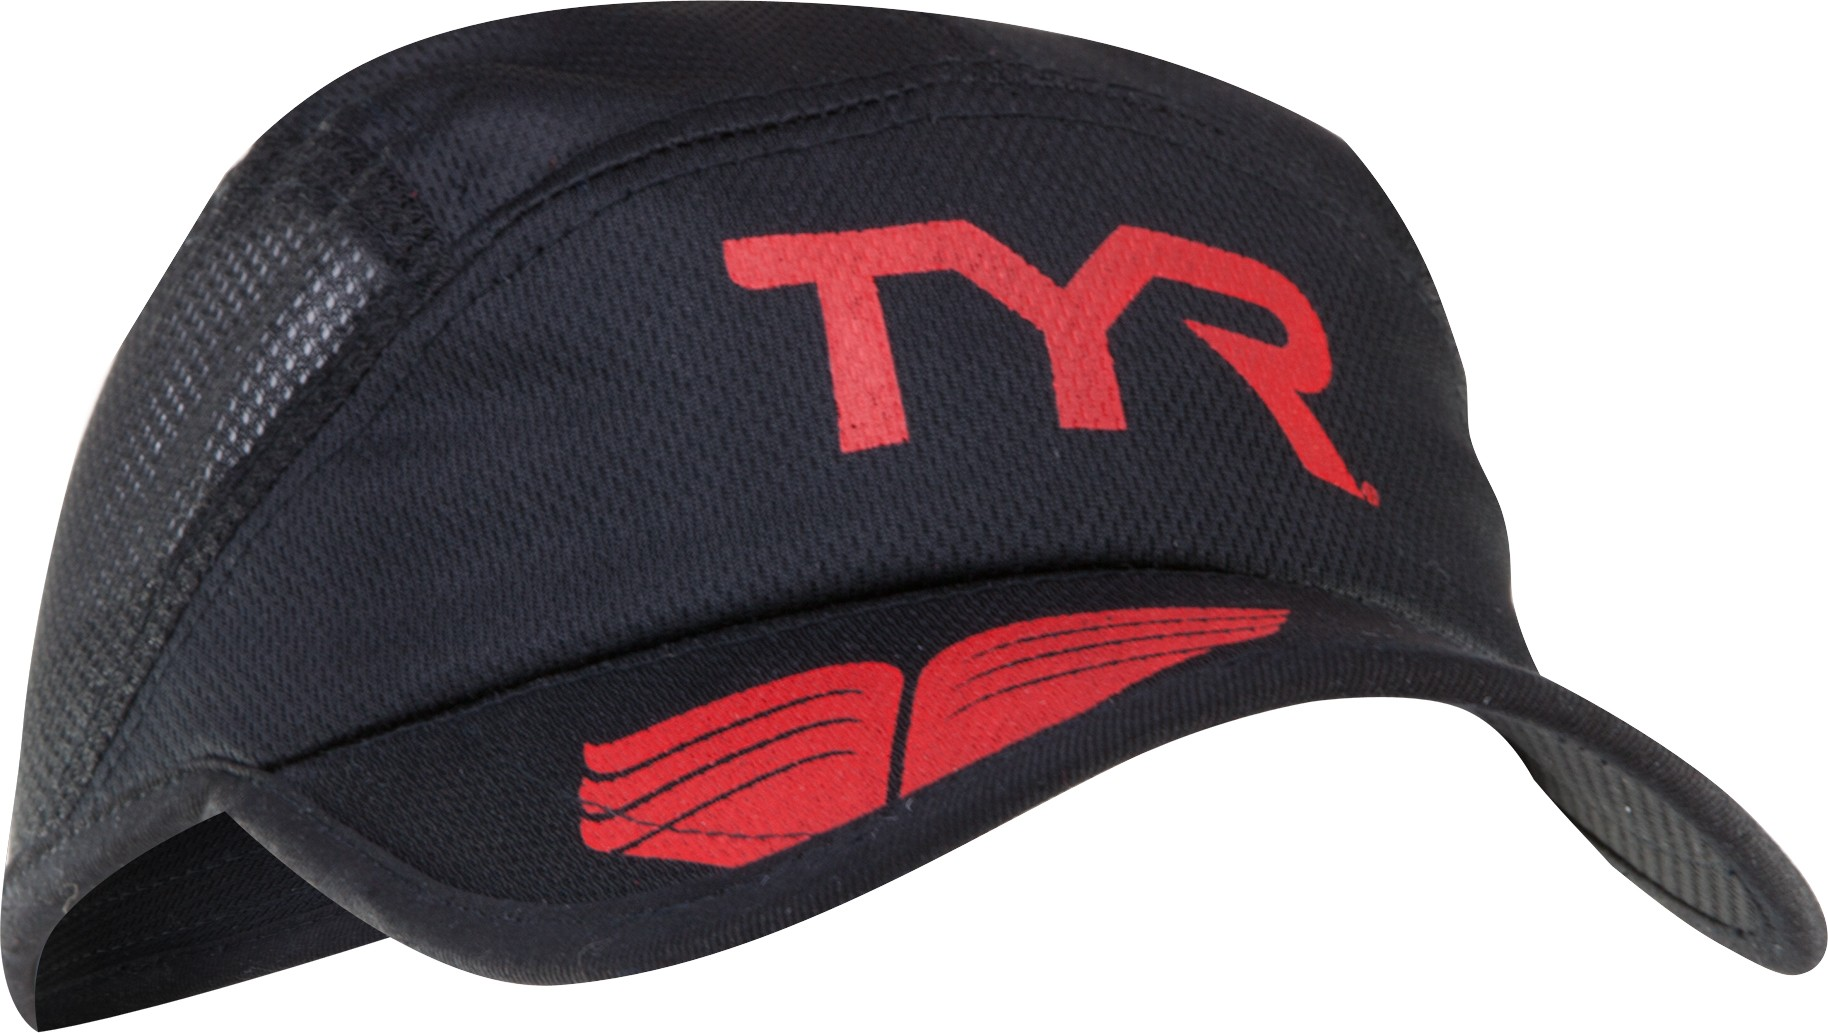 52acab897e5b6c Running Cap | TYR